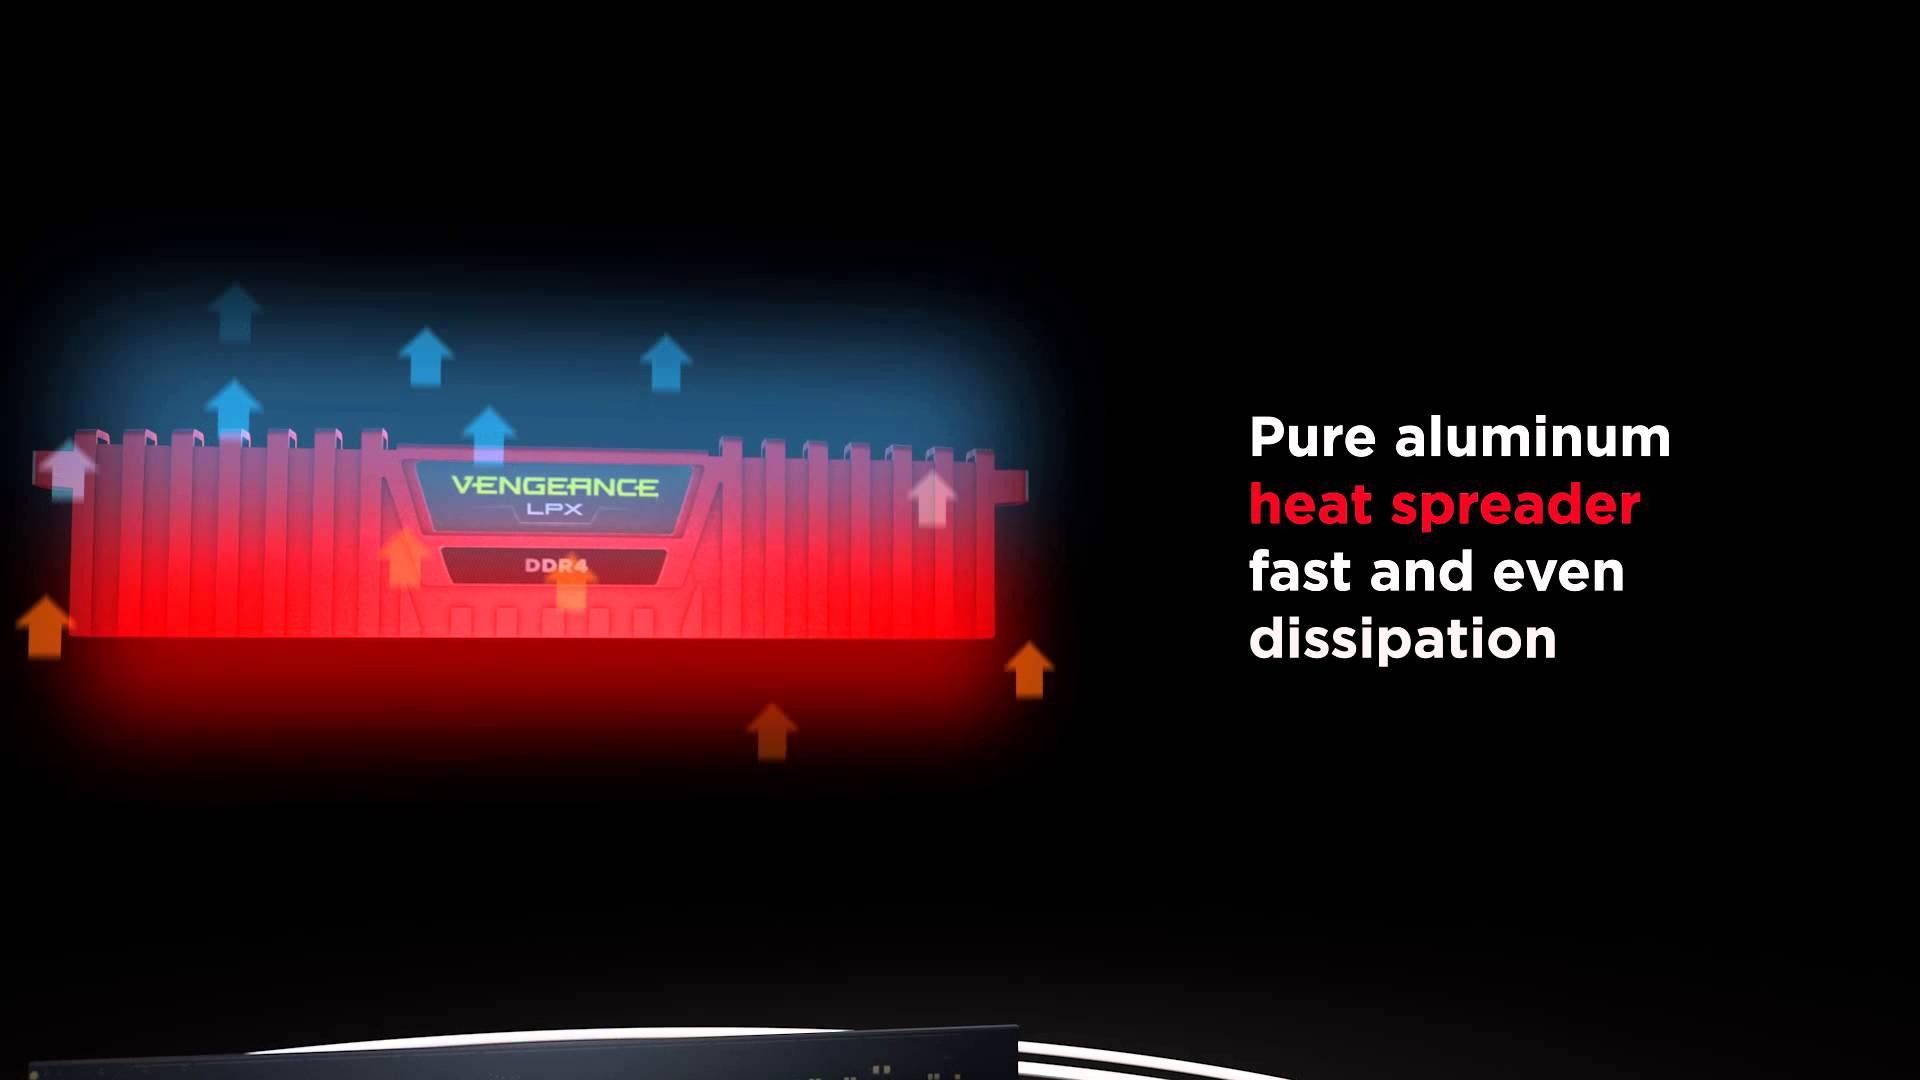 diapositiva 1 de 5,aumentar tamaño, introducing vengeance lpx high-performance ddr4 memory